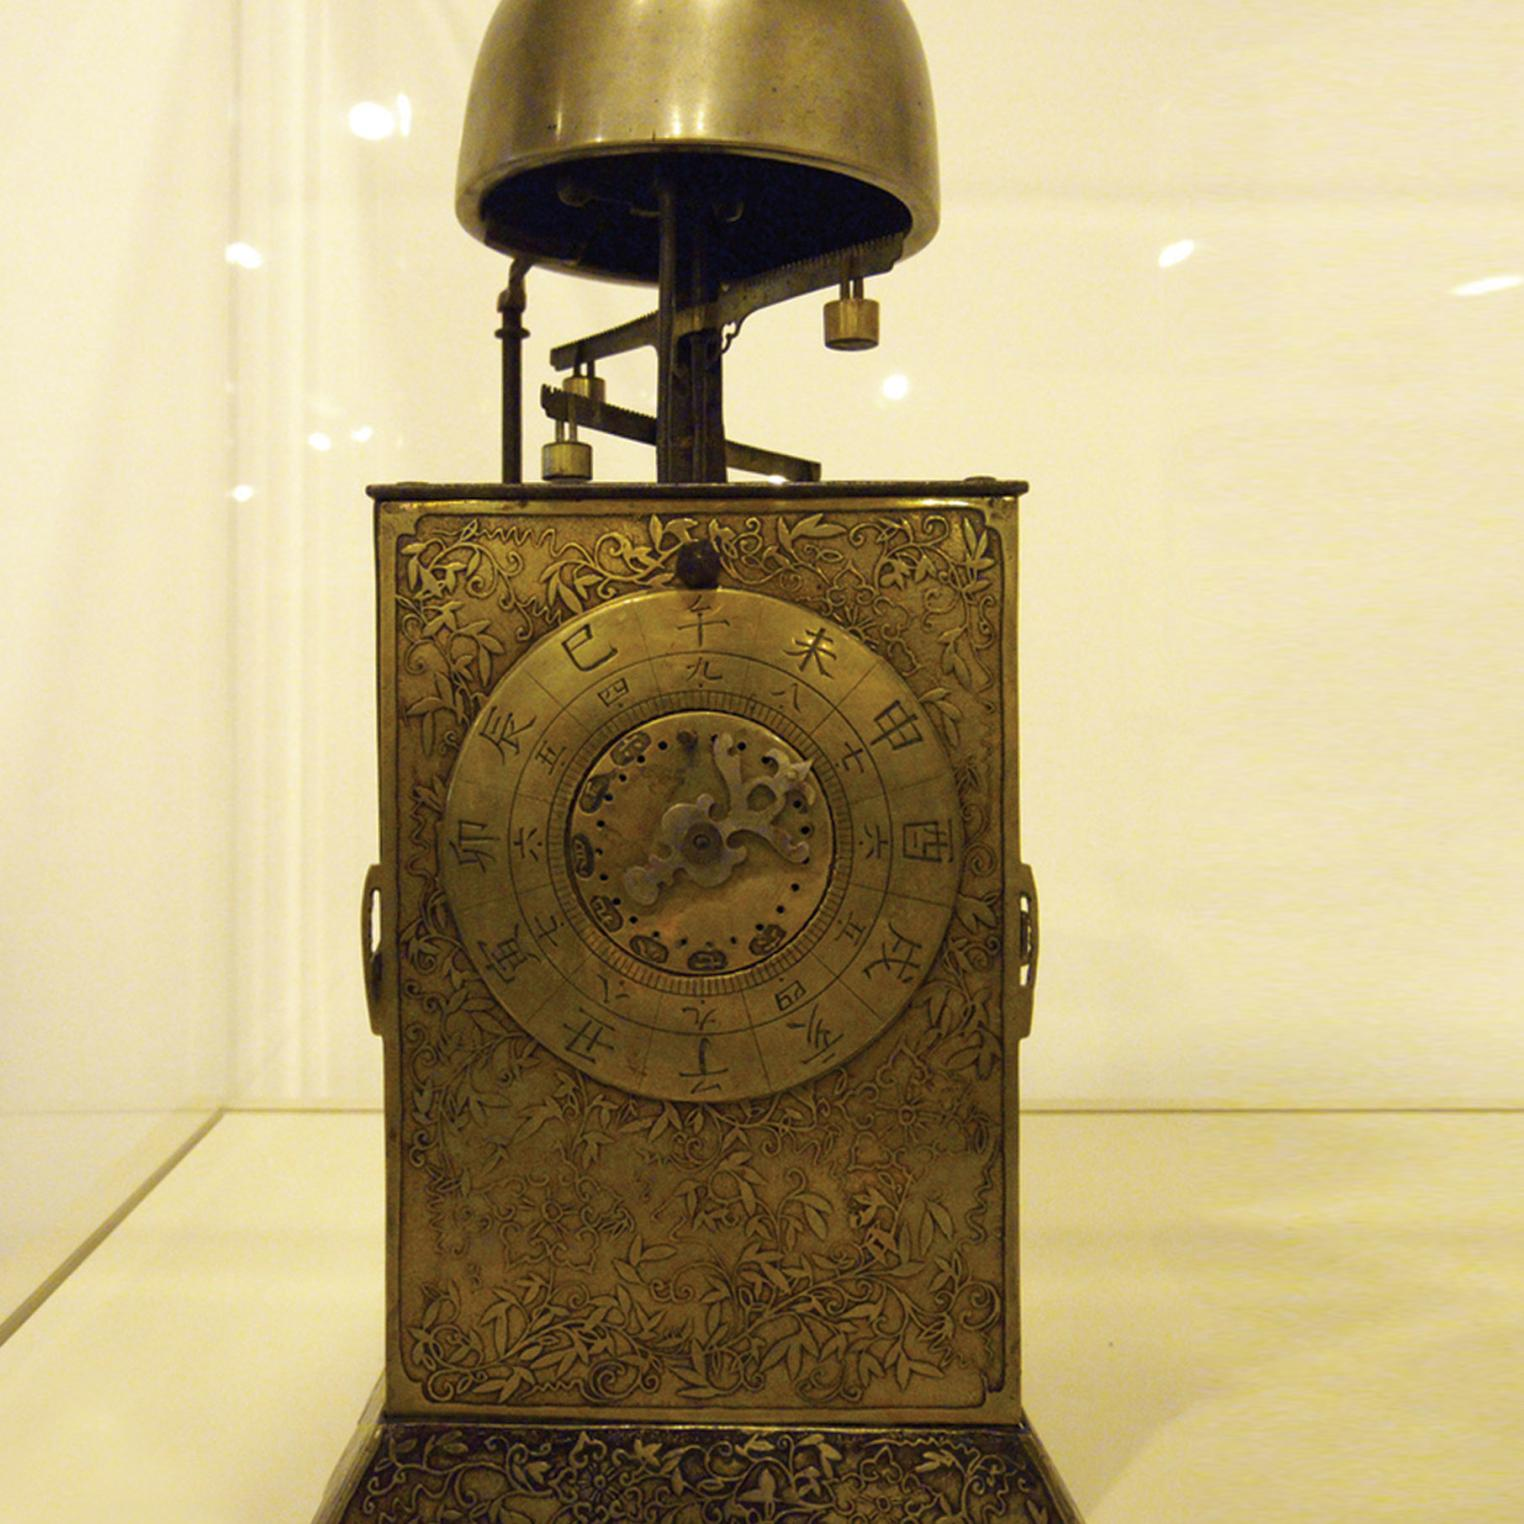 National Watch & Clock Museum